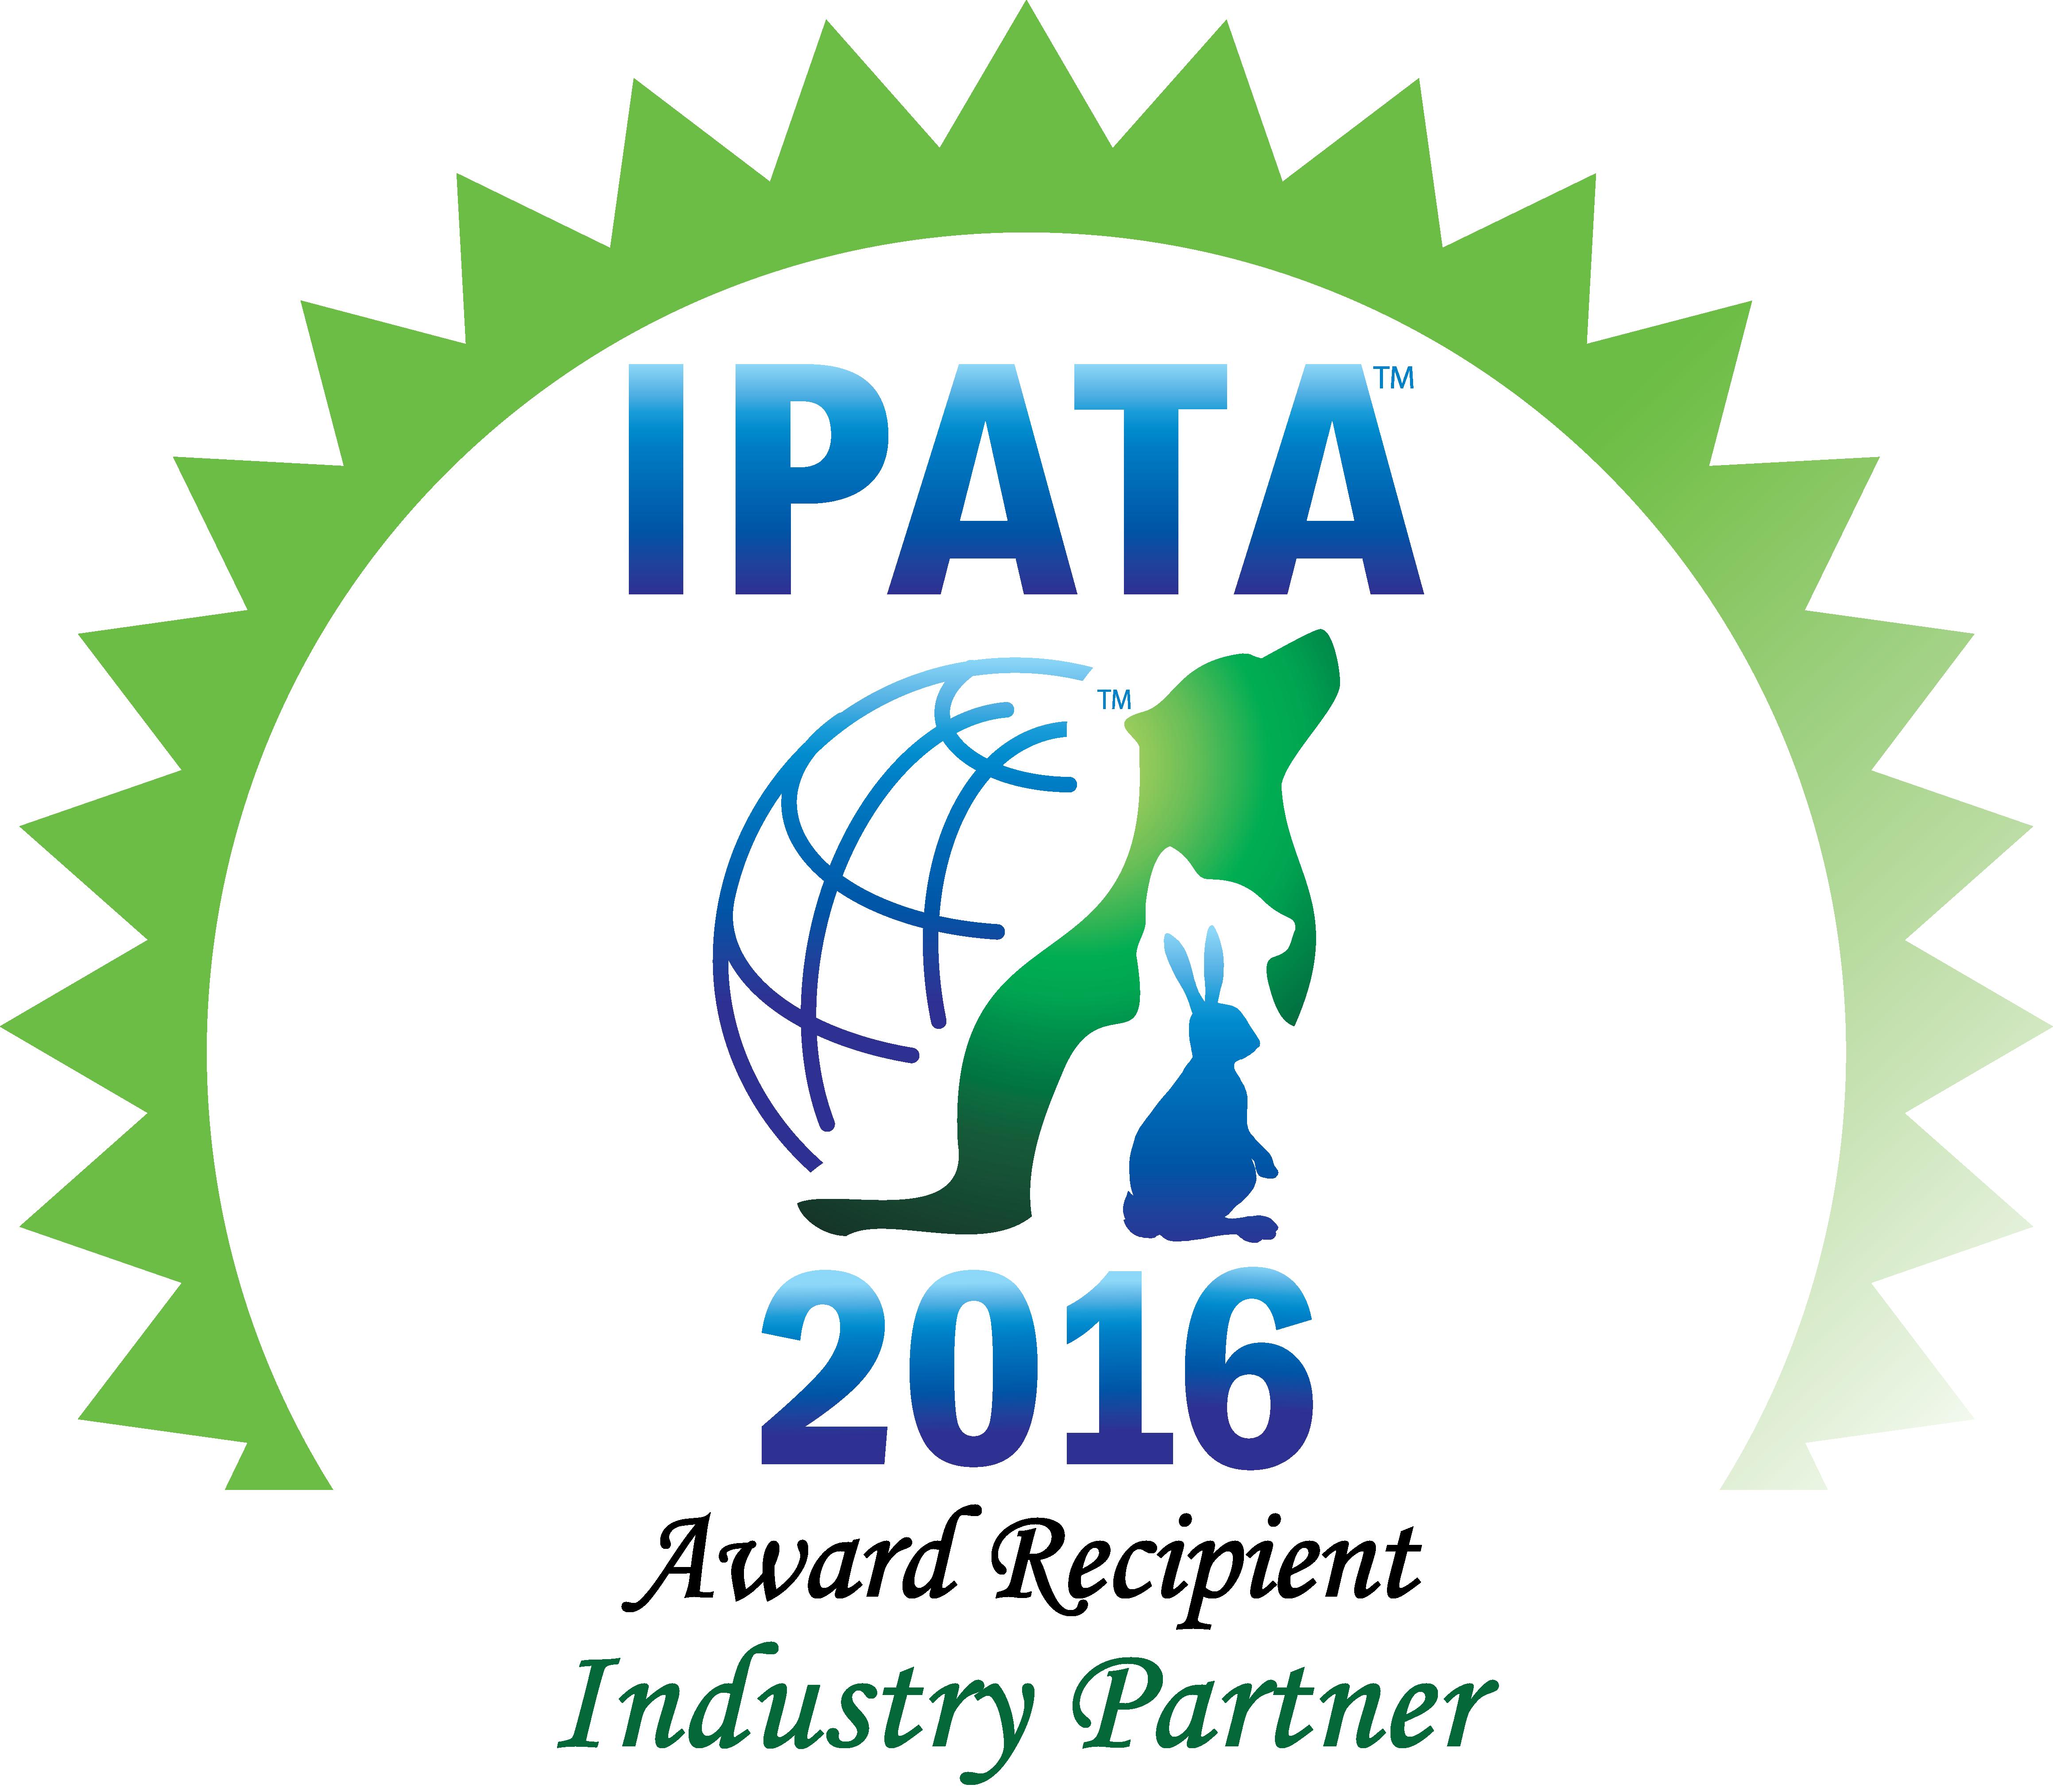 IPATA Industry Partner Award